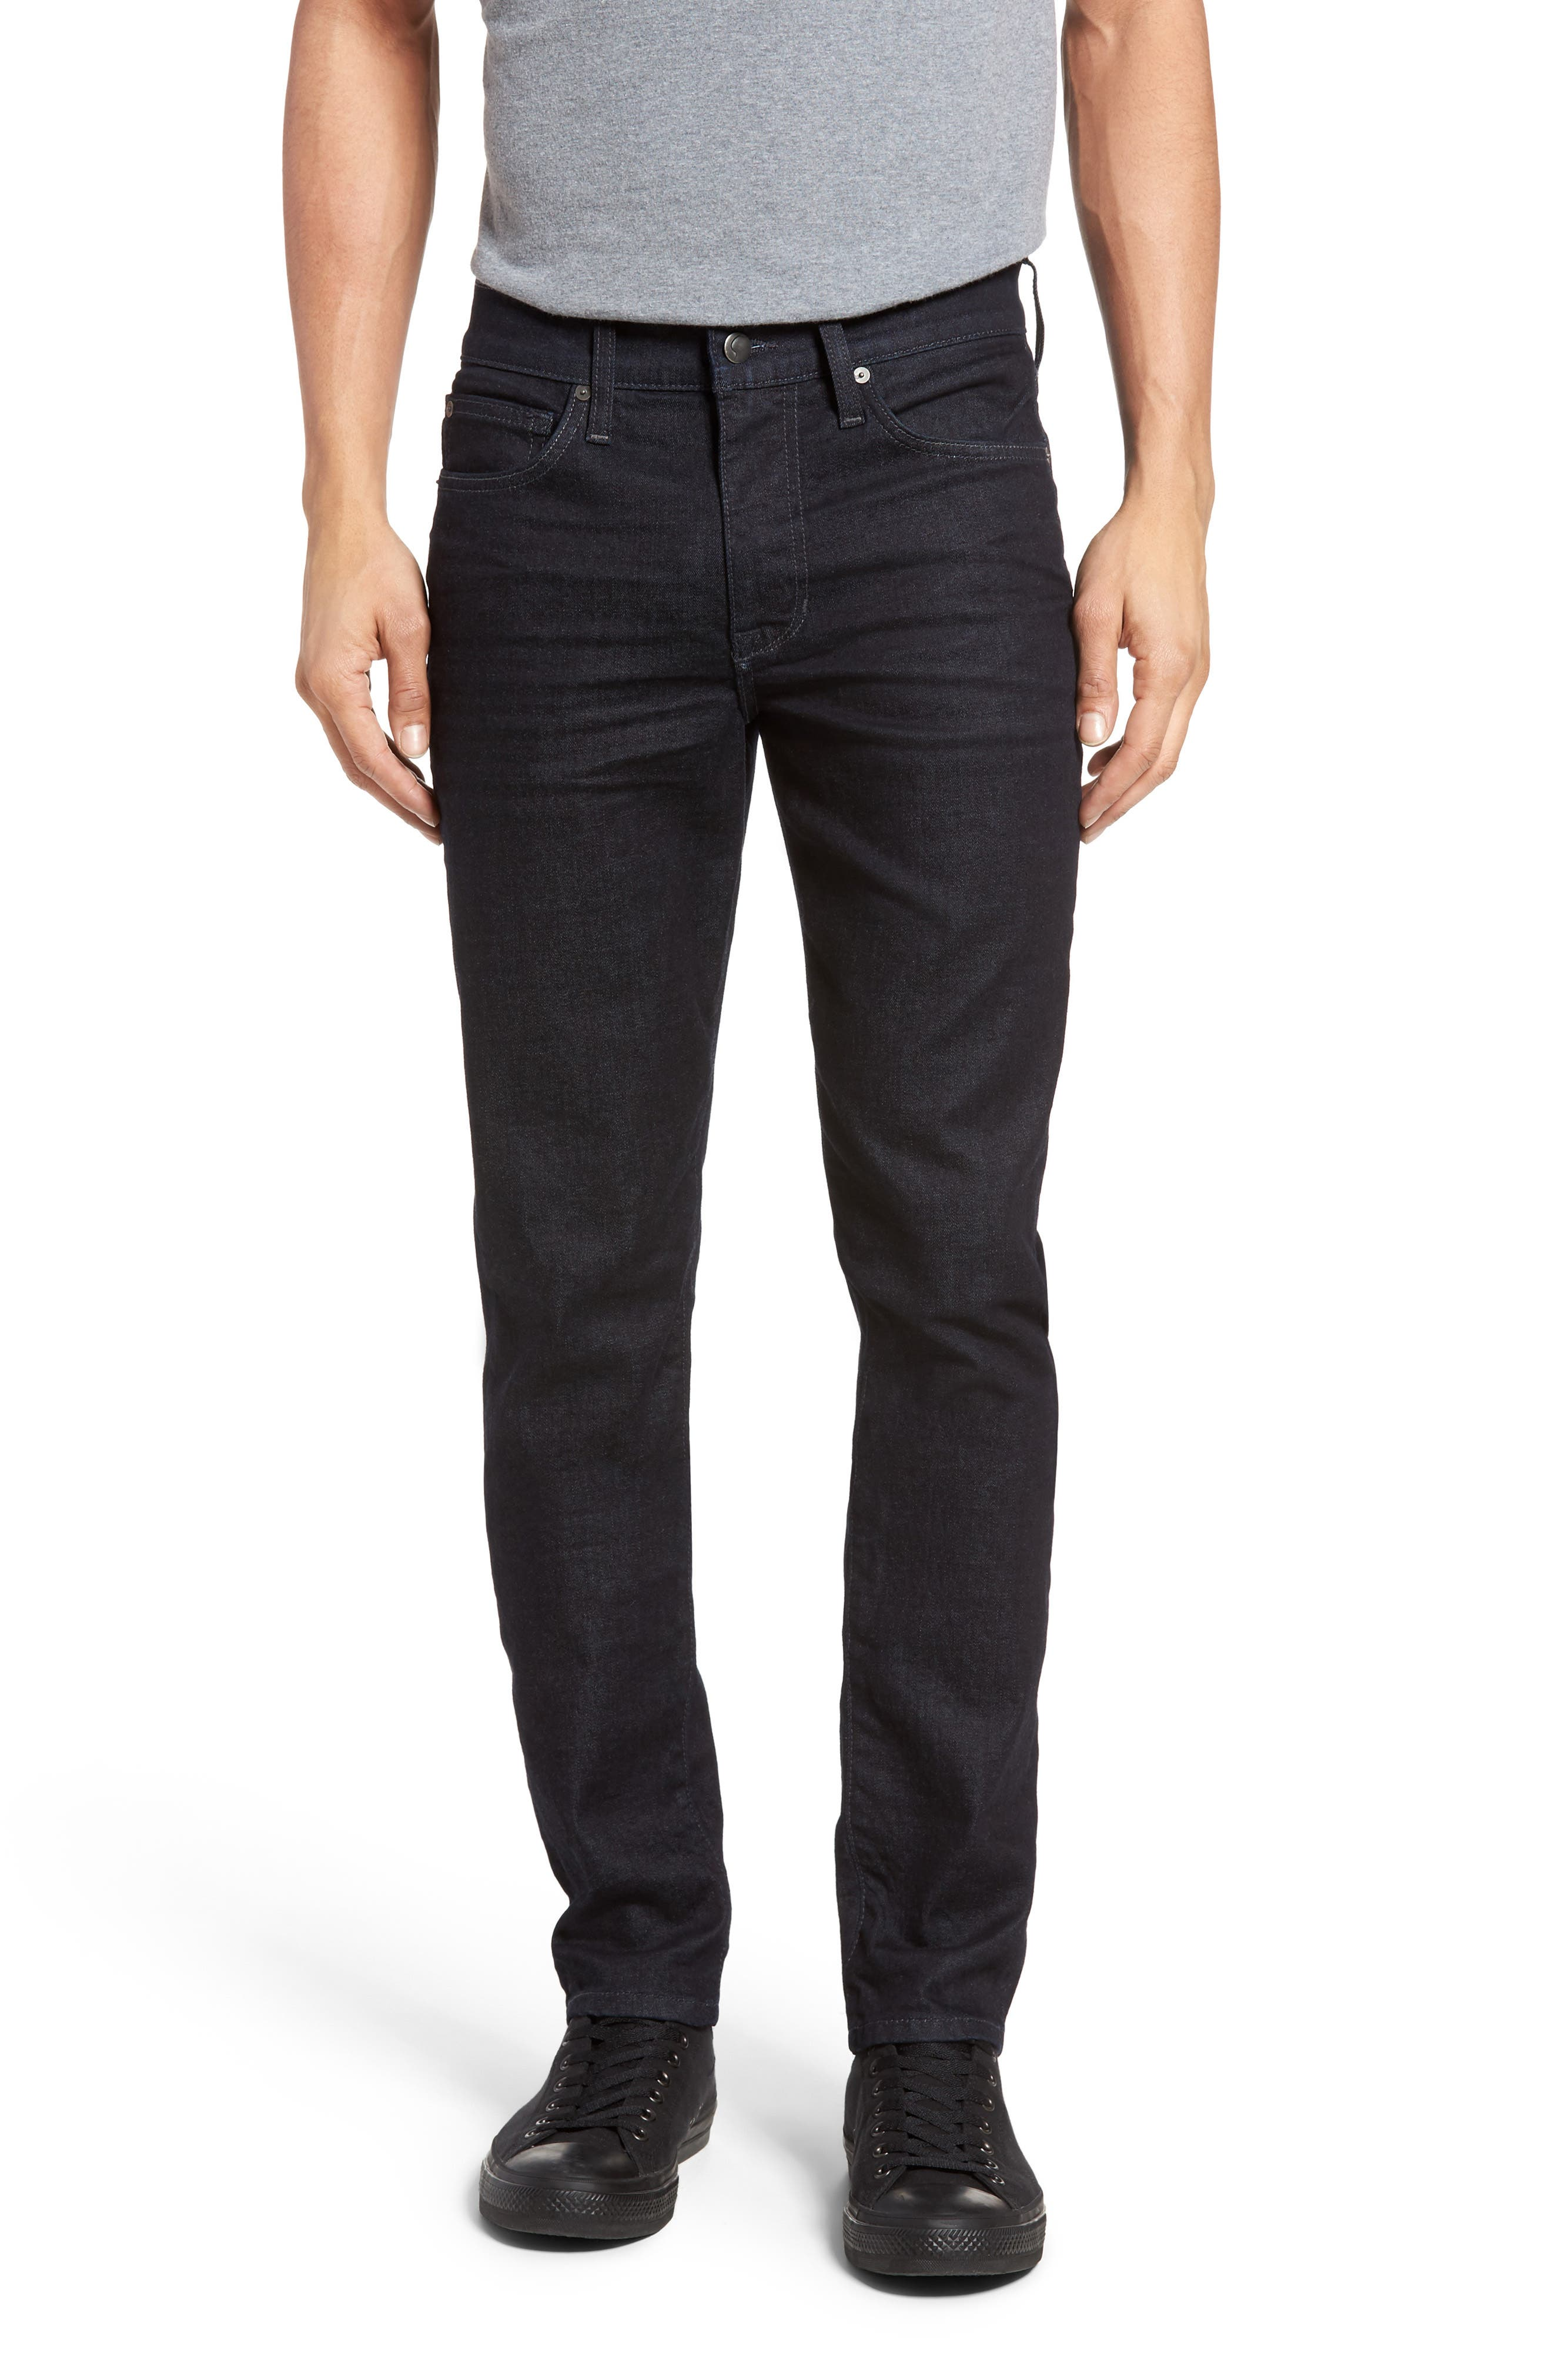 Alternate Image 1 Selected - Joe's Slim Fit Jeans (Nuhollis)